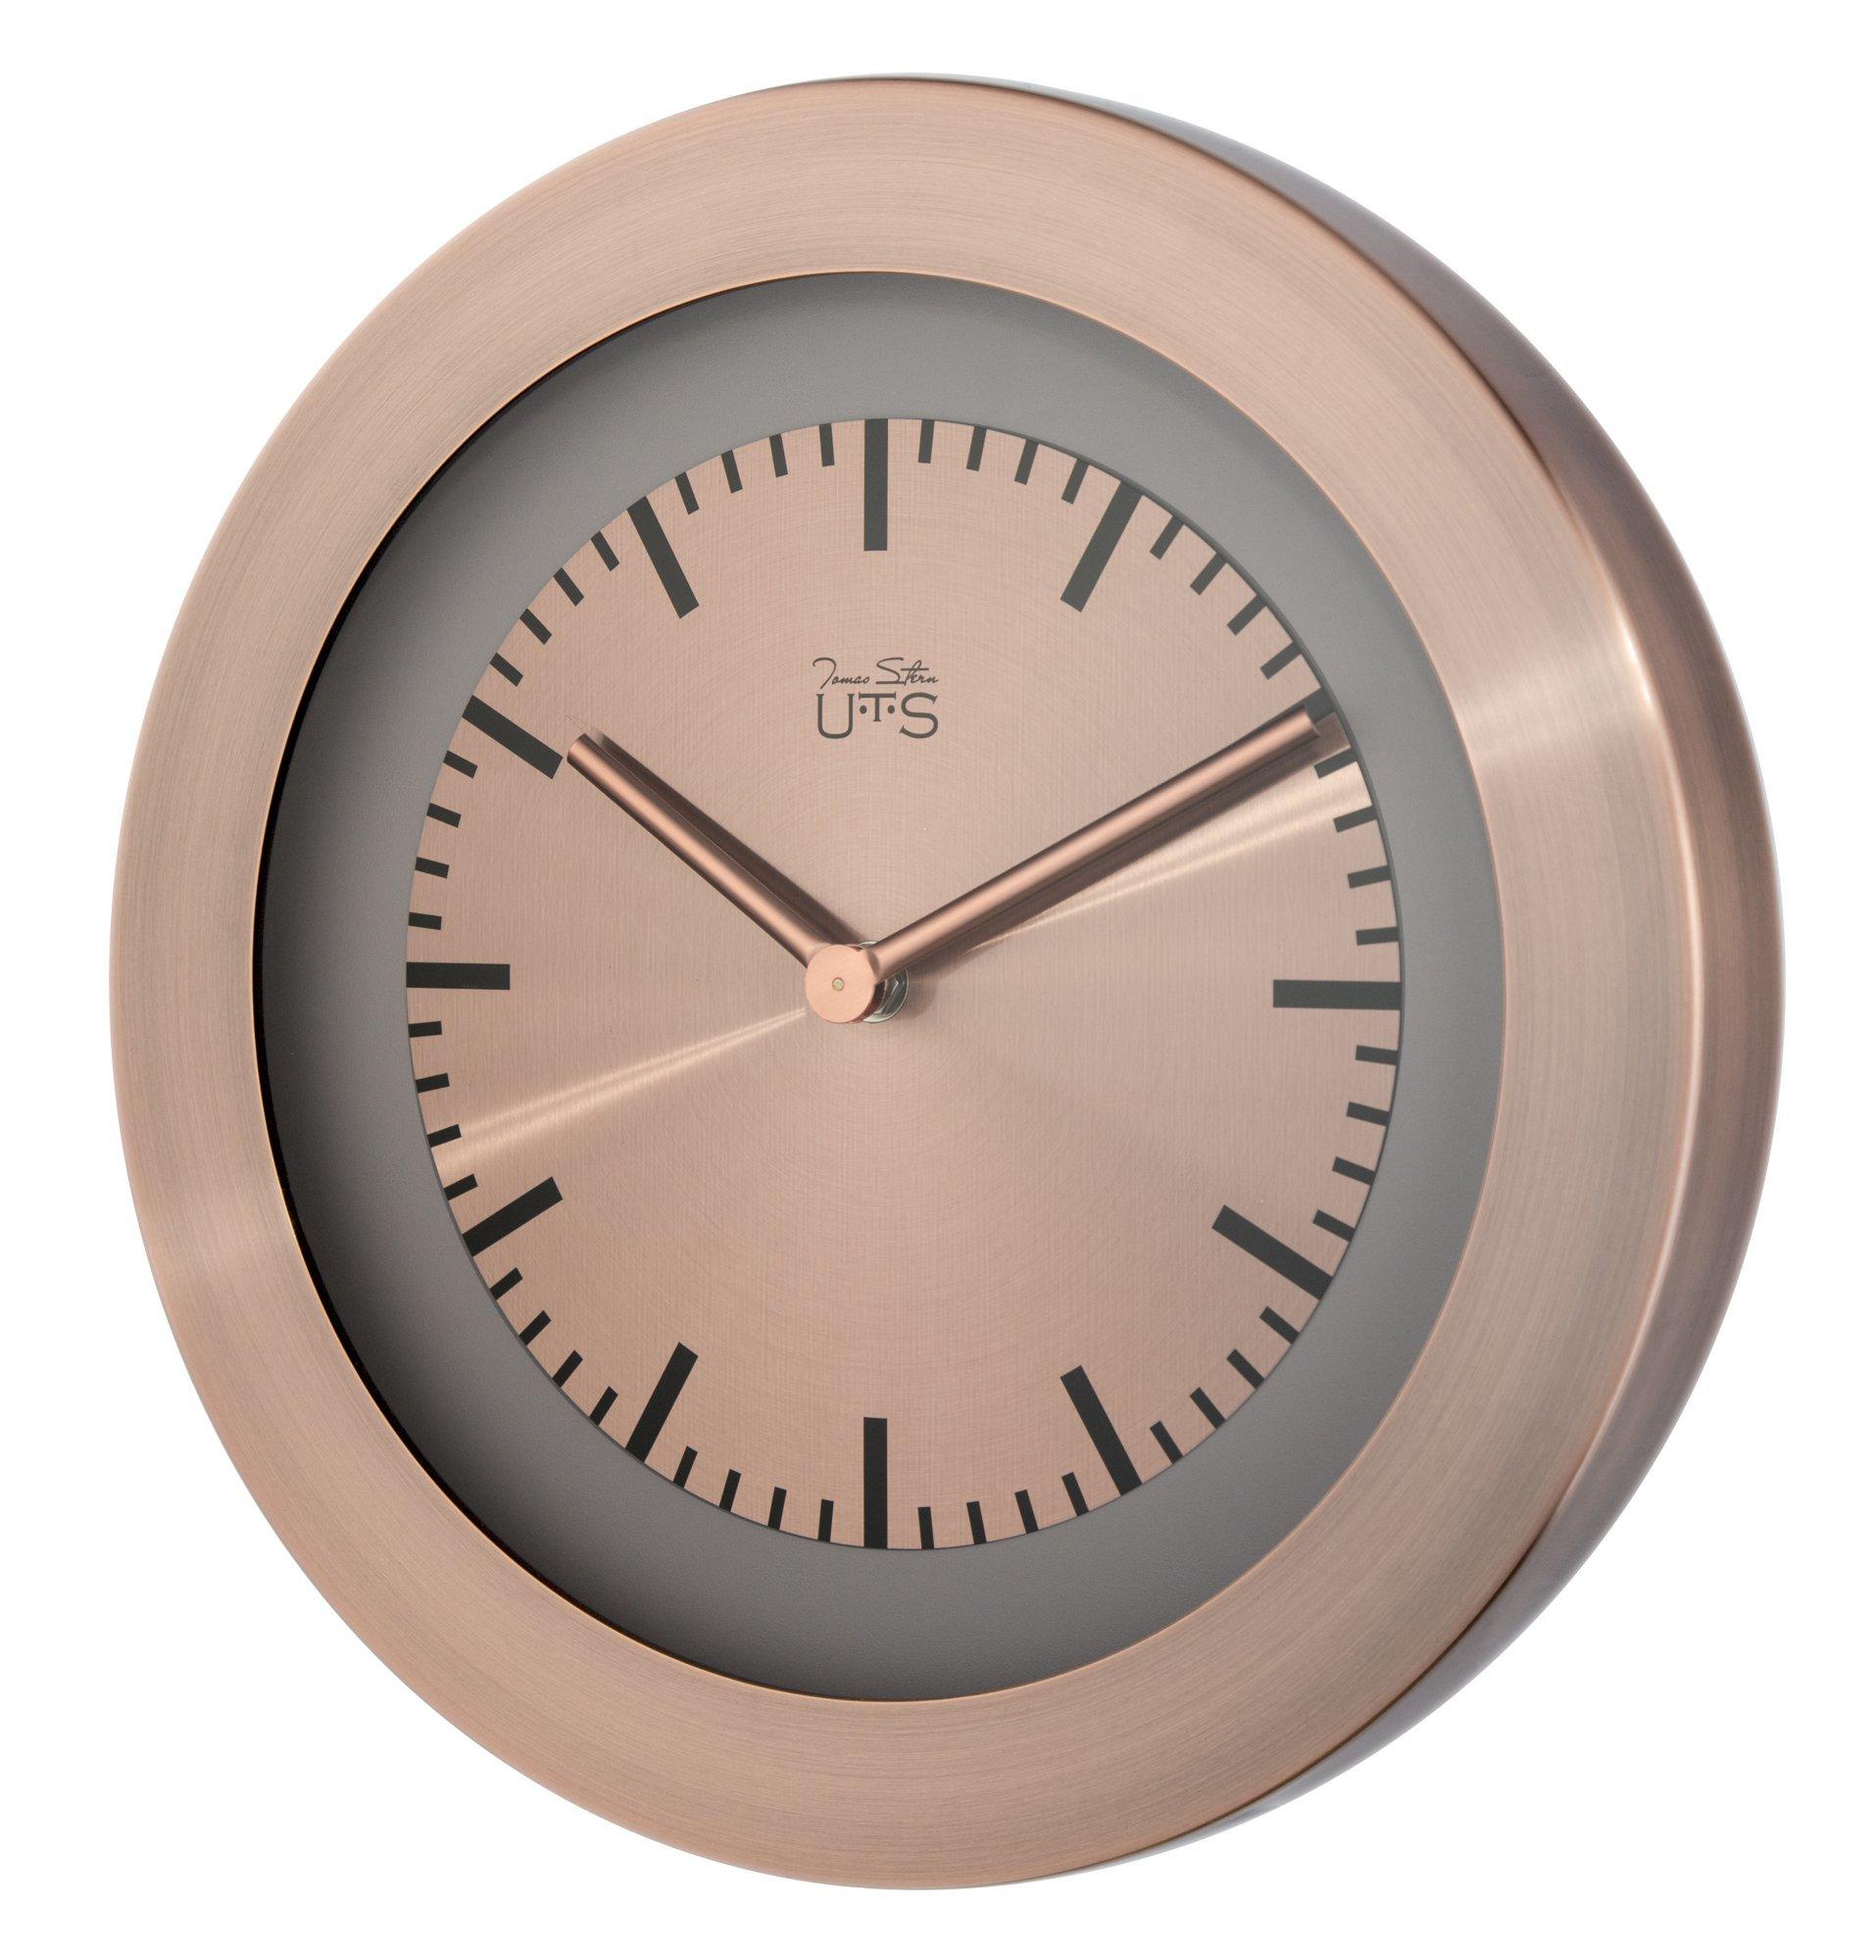 Часы настенные Часы настенные Tomas Stern 4008AC chasy-nastennye-tomas-stern-4008ac-germaniya.jpg